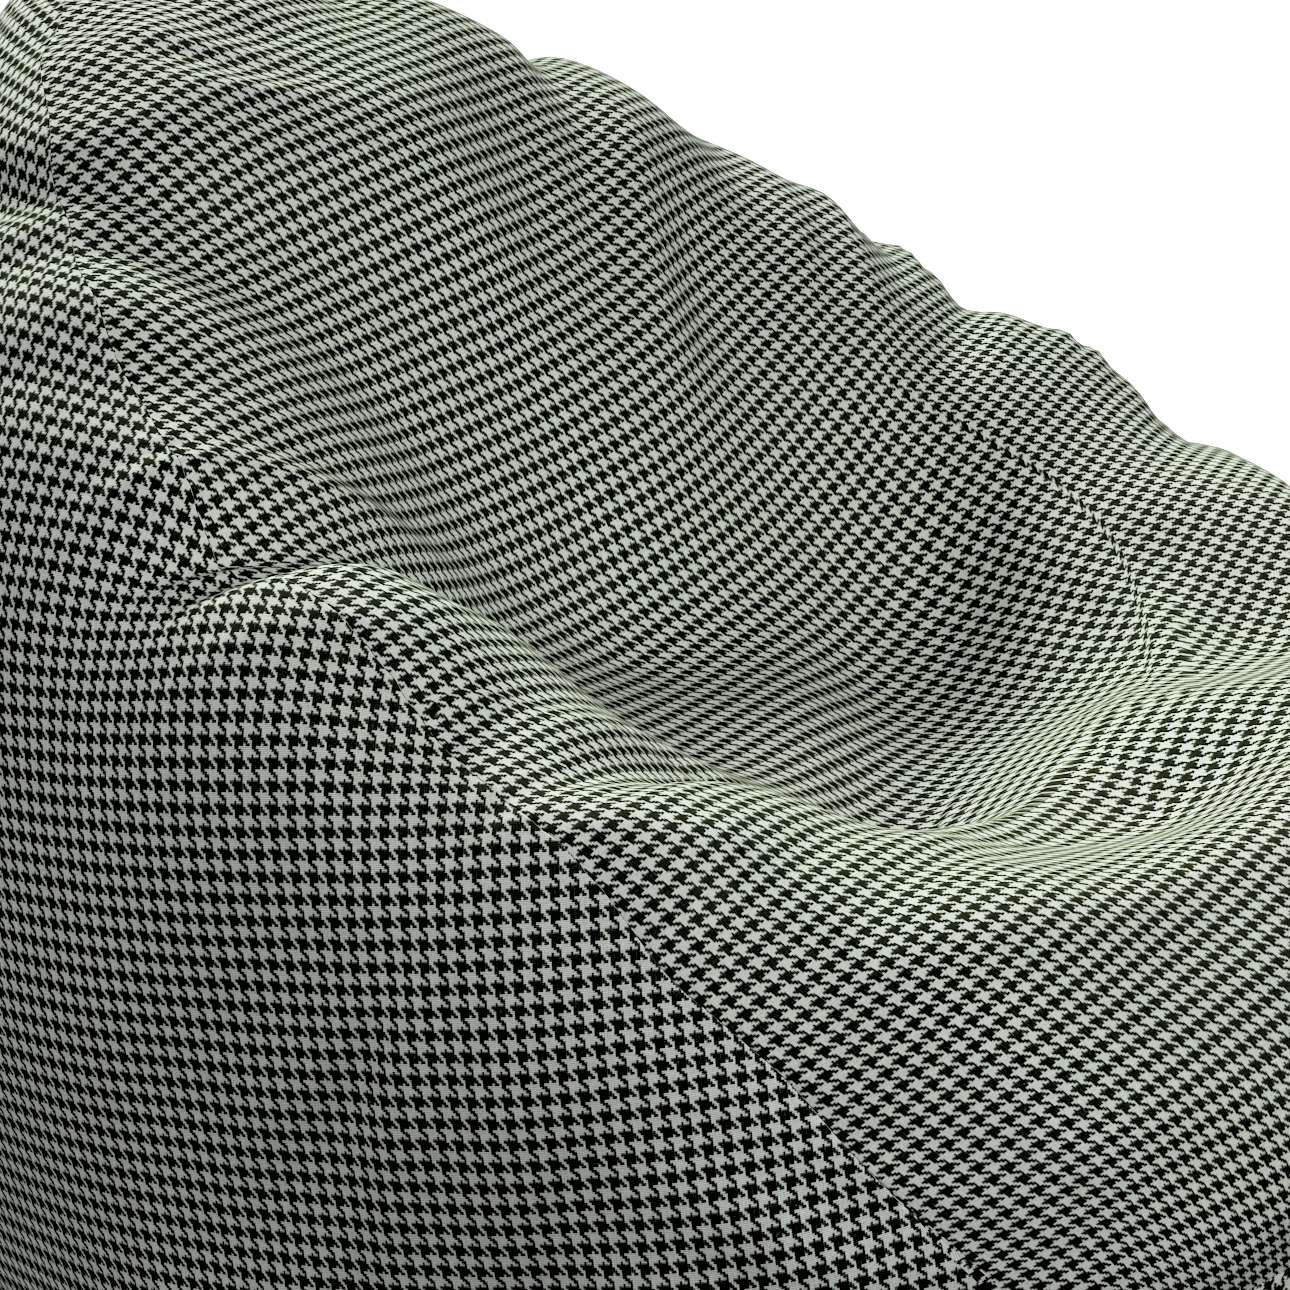 Sækkestol fra kollektionen Black & White, Stof: 142-77